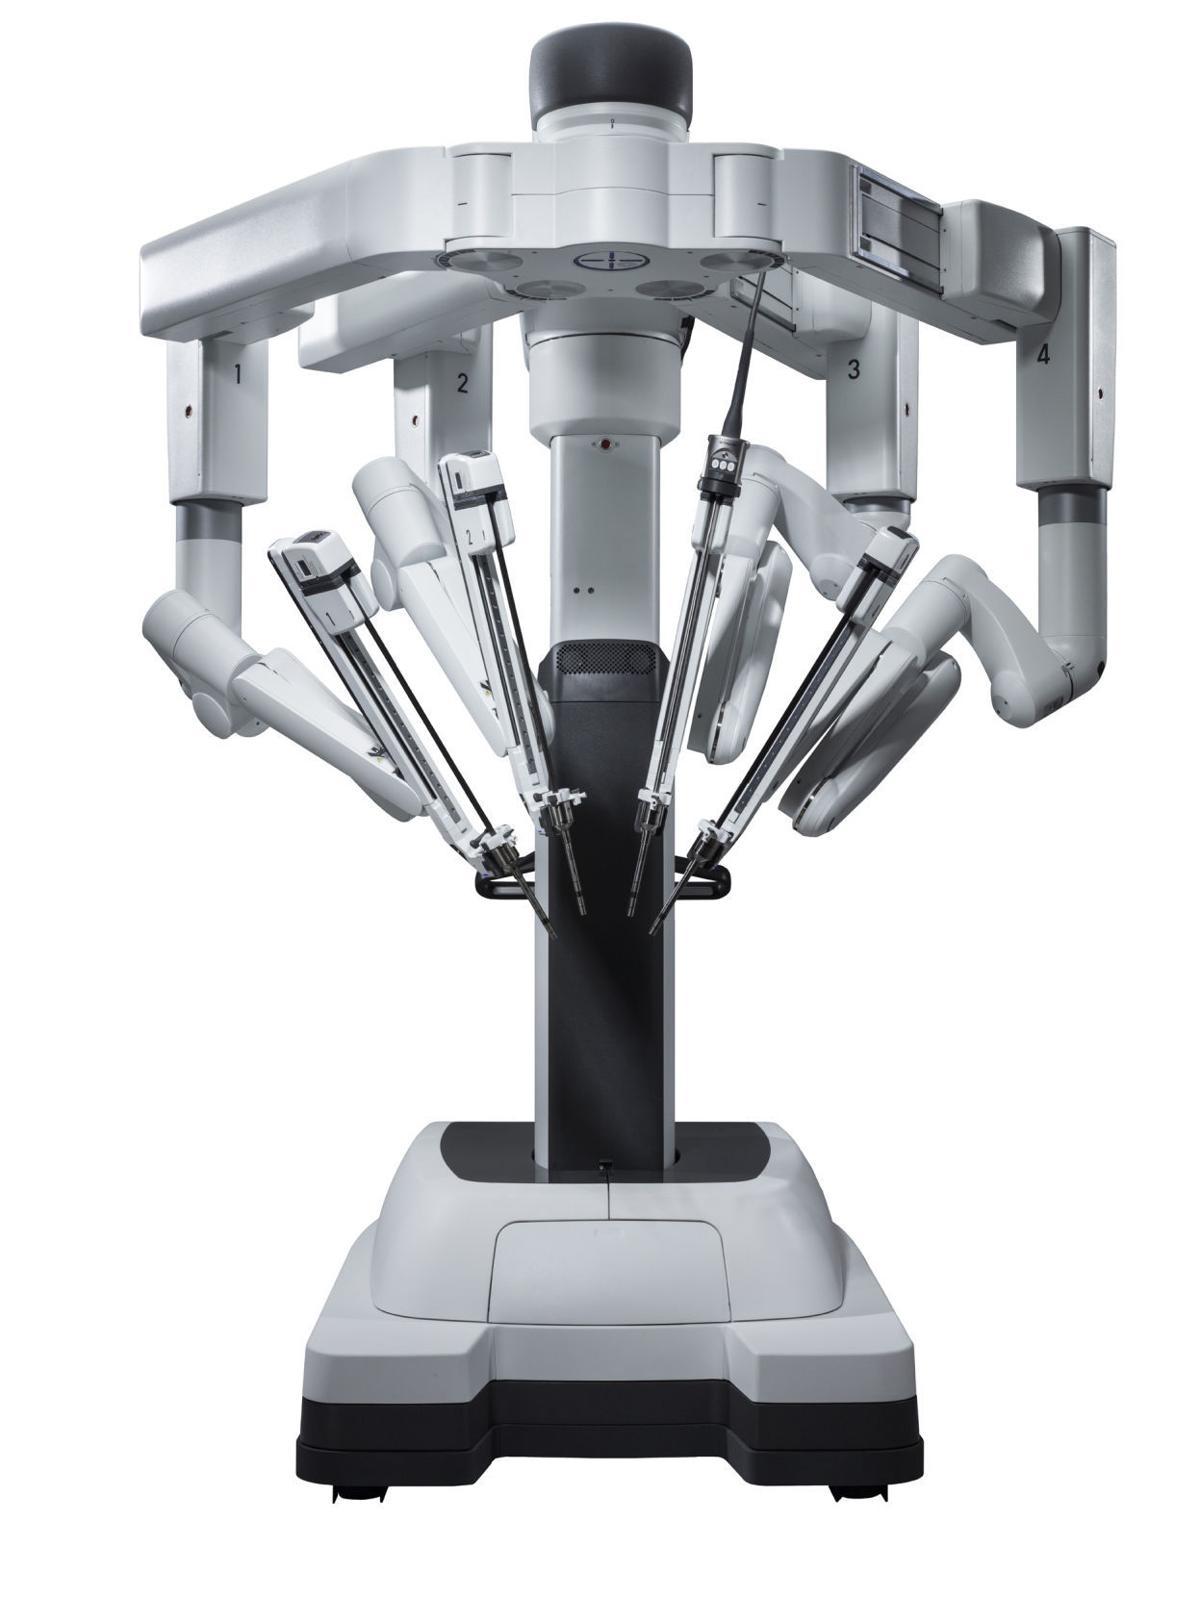 IRMC Robot